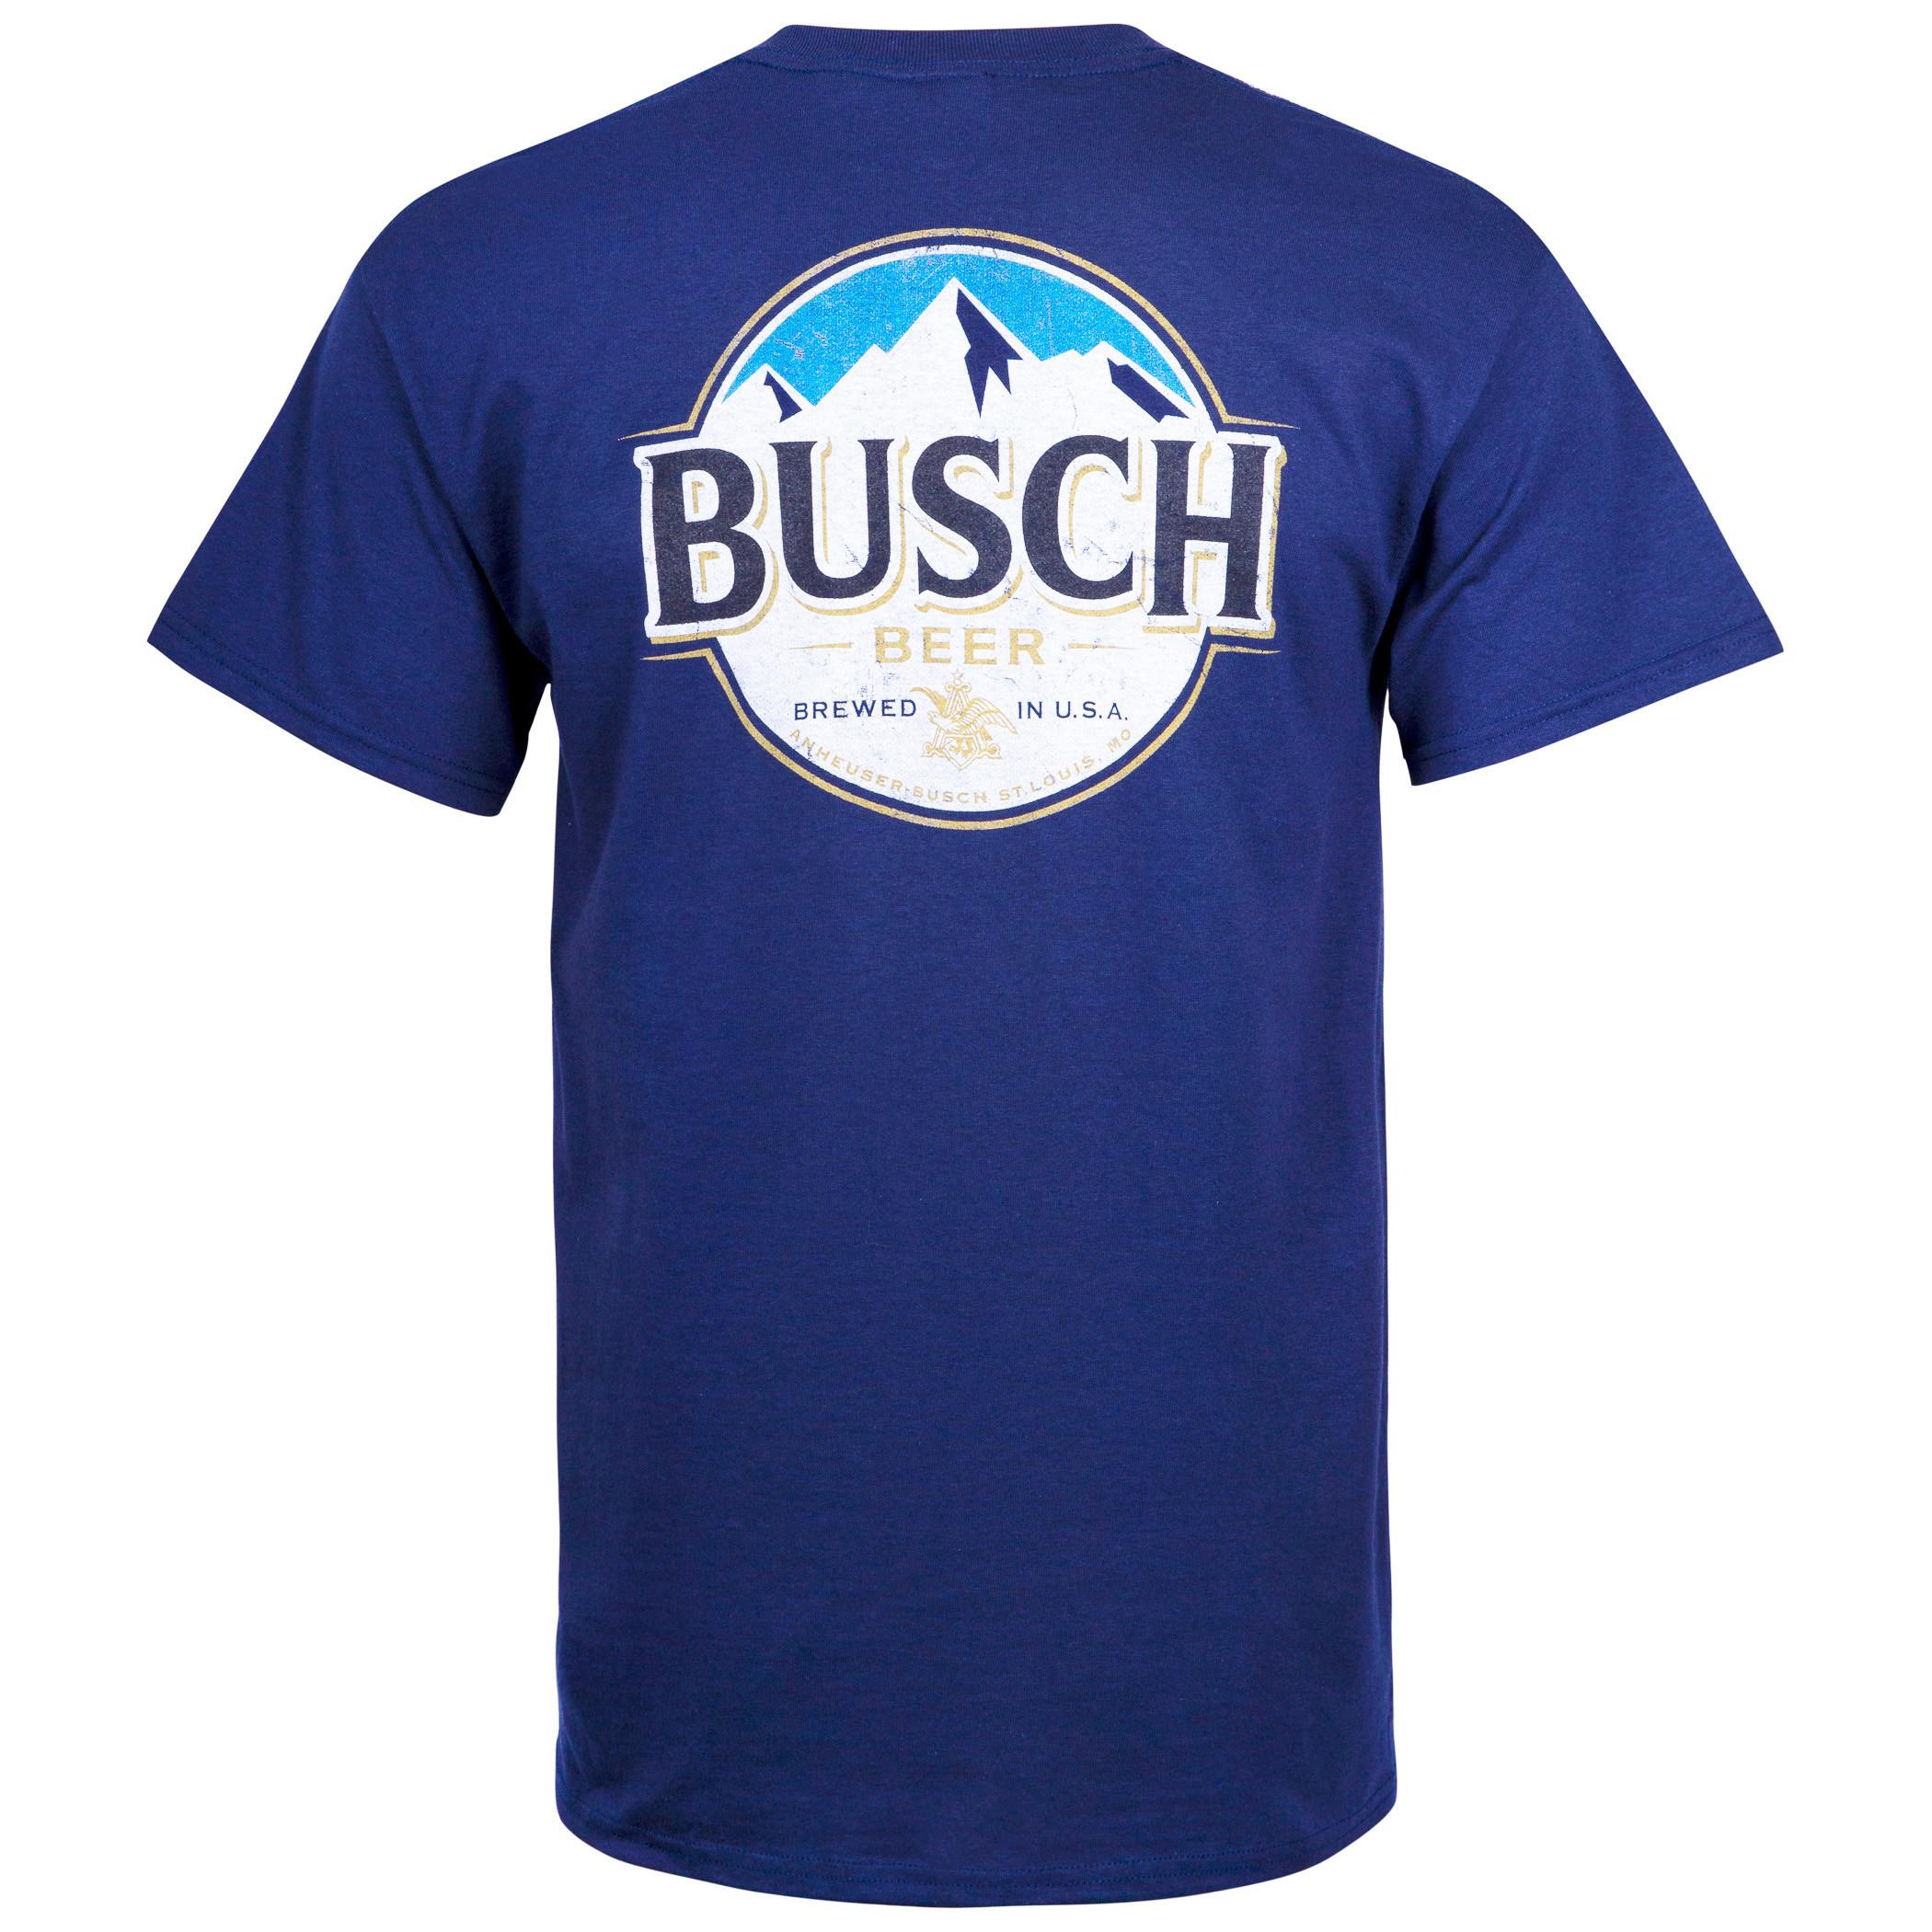 Busch Front And Back Print Blue Pocket Tee Shirt